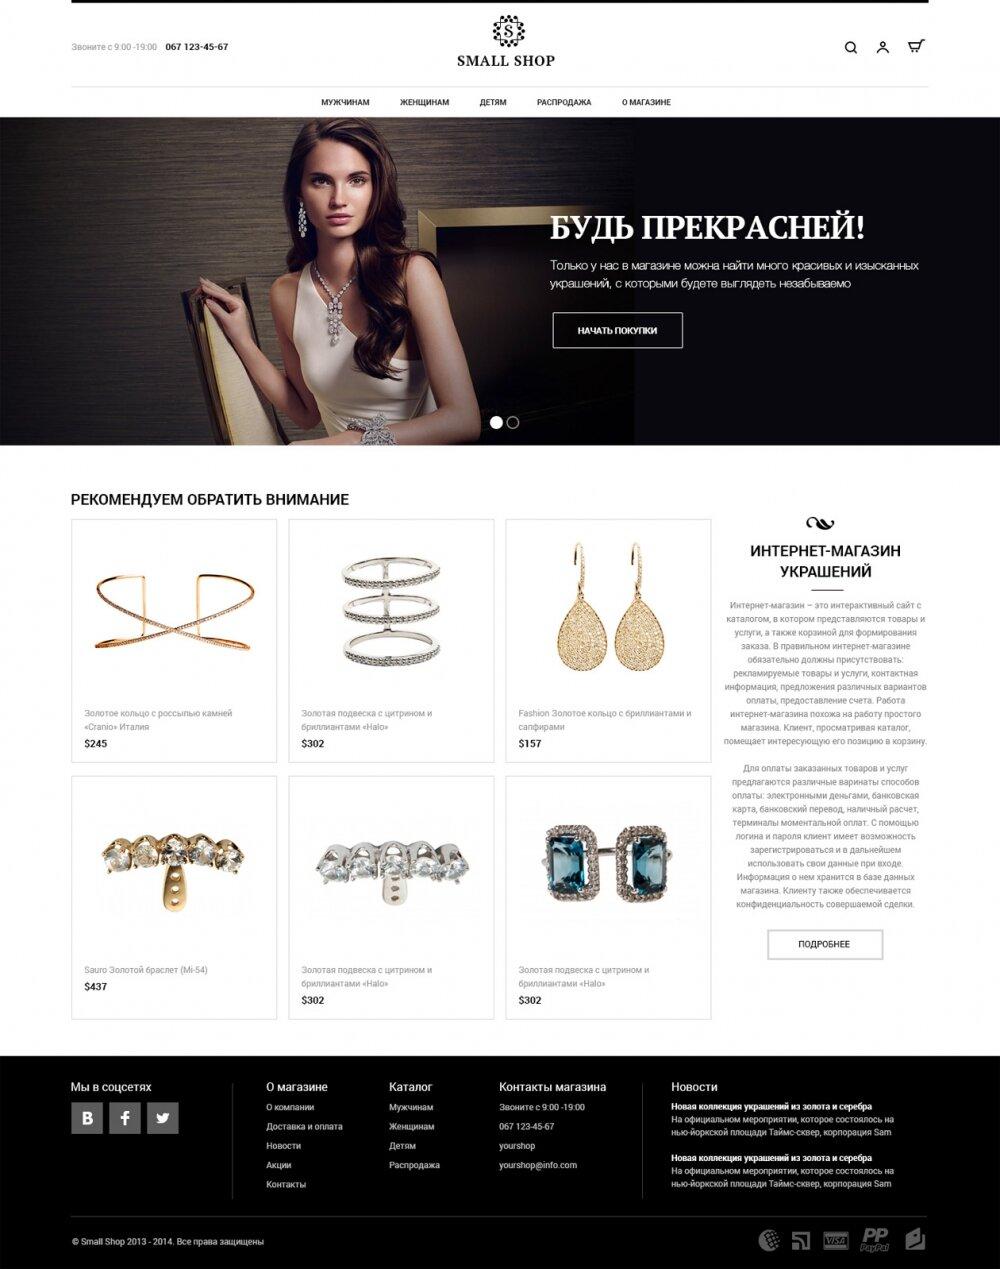 Бесплатный шаблон интернет-магазина Simple Shop Ювелірні товари та прикраси - 1 Small